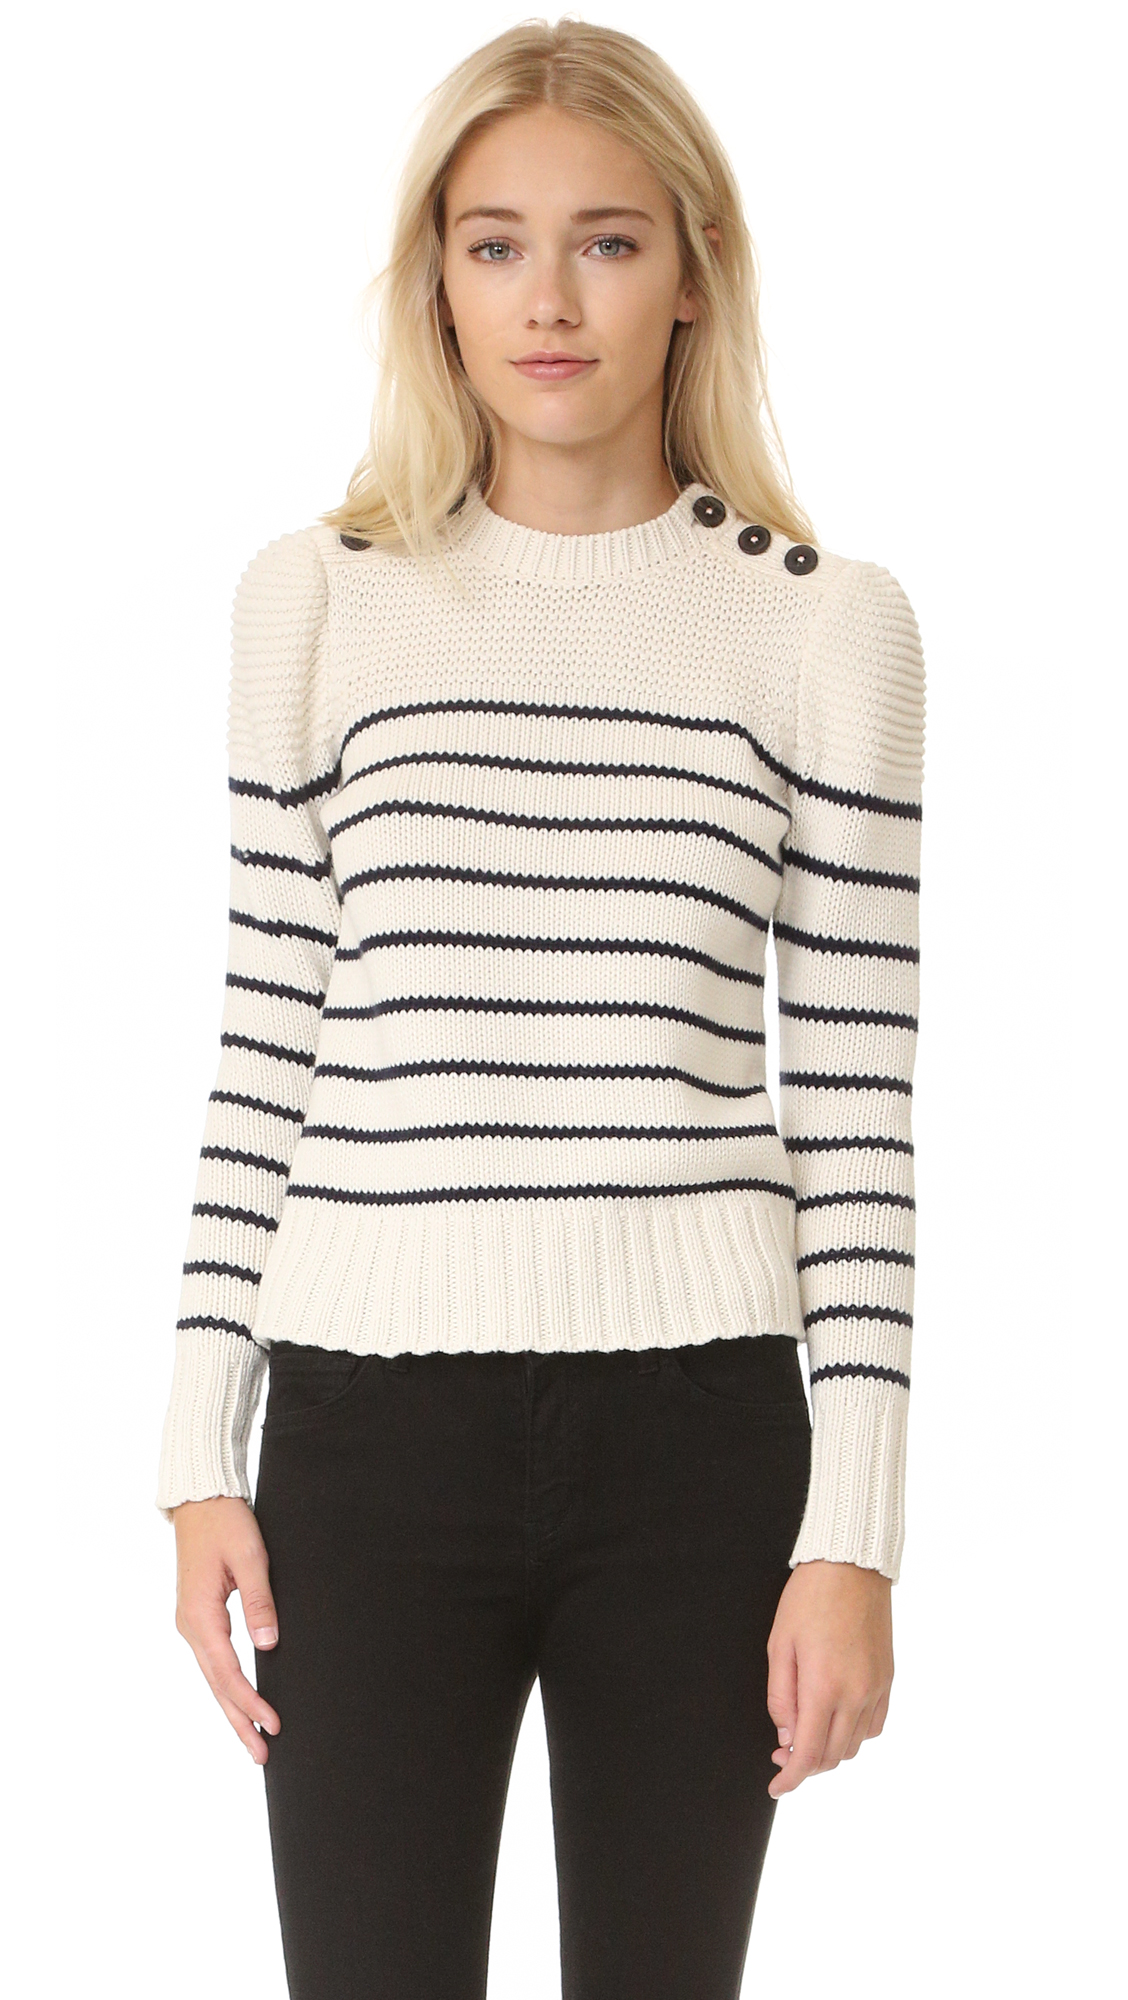 La Vie Rebecca Taylor Cotton Stripe Pullover - Chalk With Navy Stripes at Shopbop